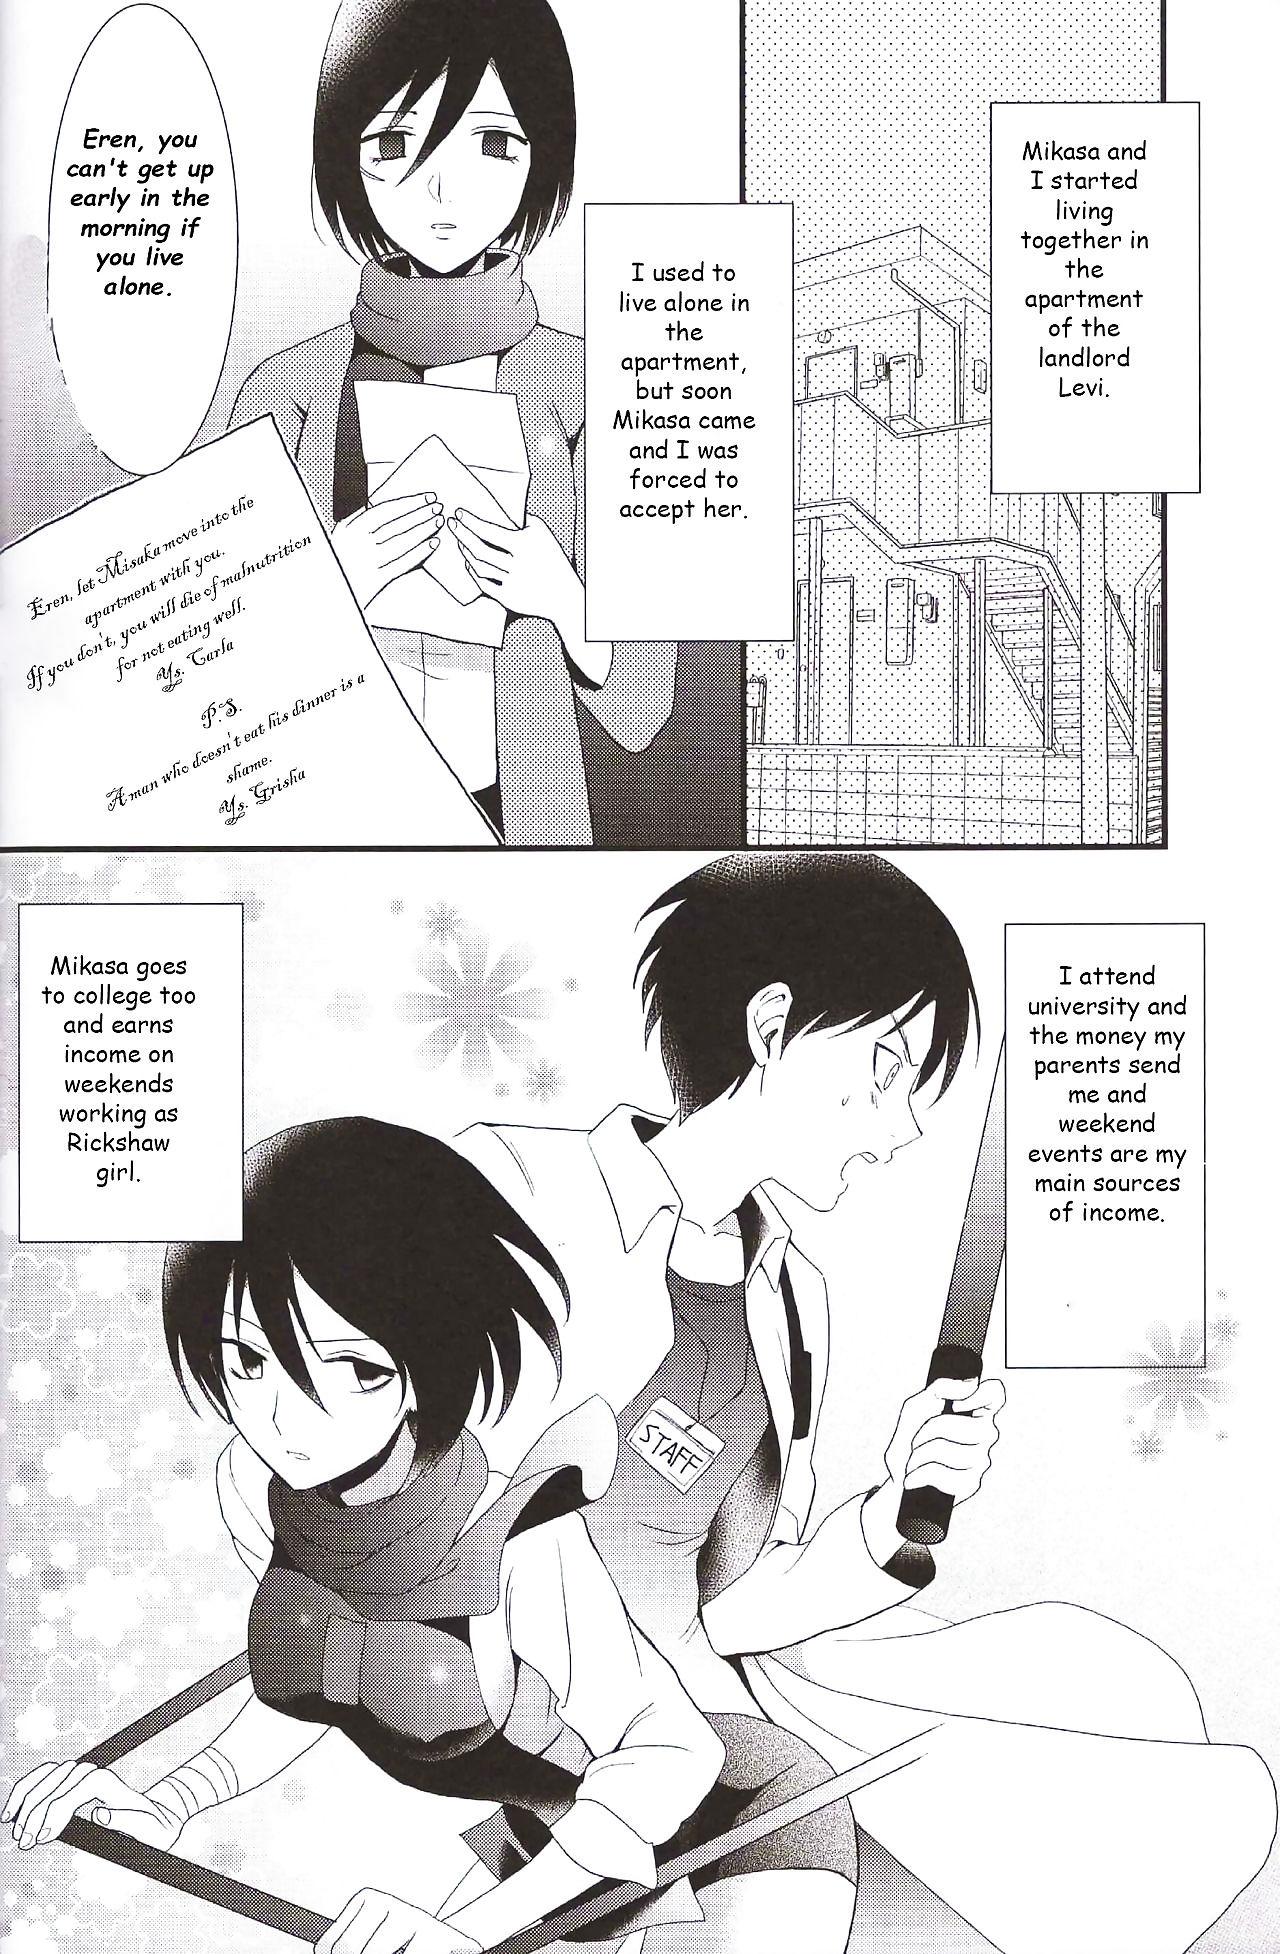 Deutsch manga sex Mangapornos anime